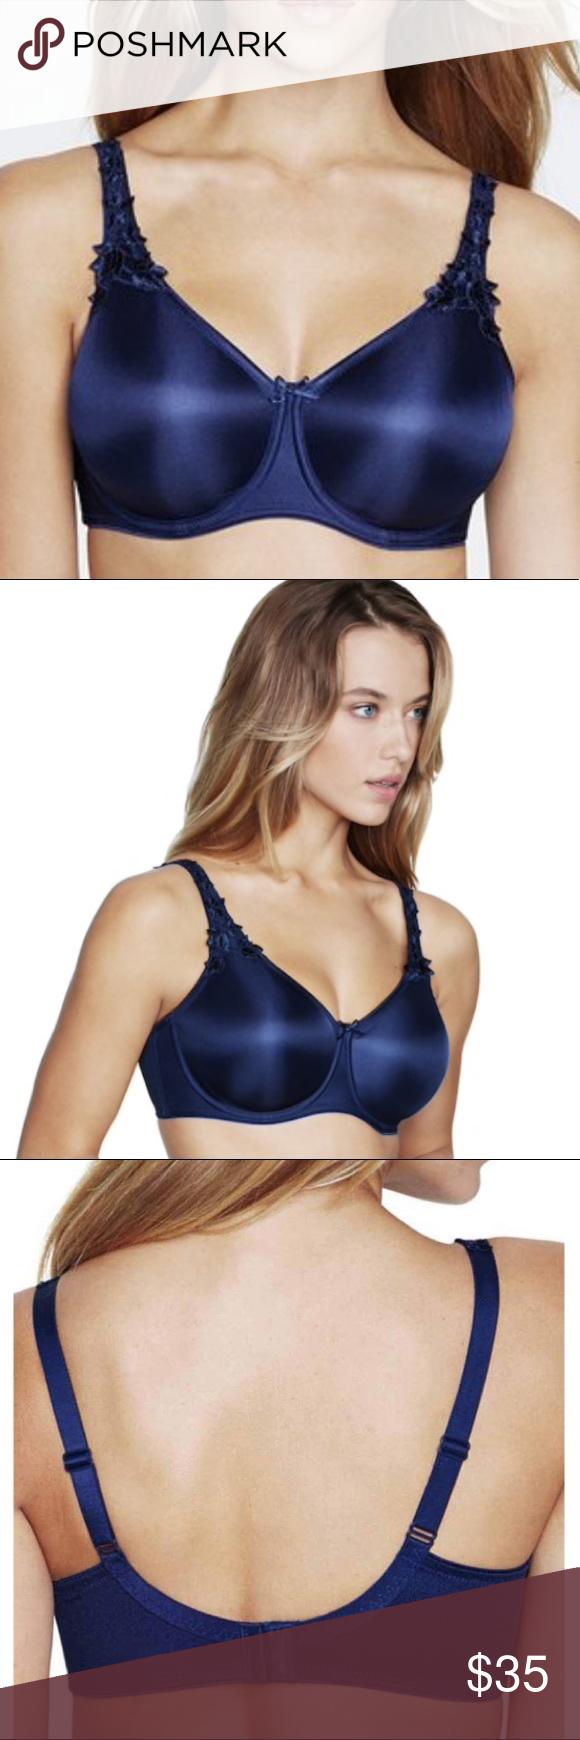 aefbf2cde46 Dominique Seamless Minimizer Bra 7000 Navy Blue This shape-defining bra  provides discreet